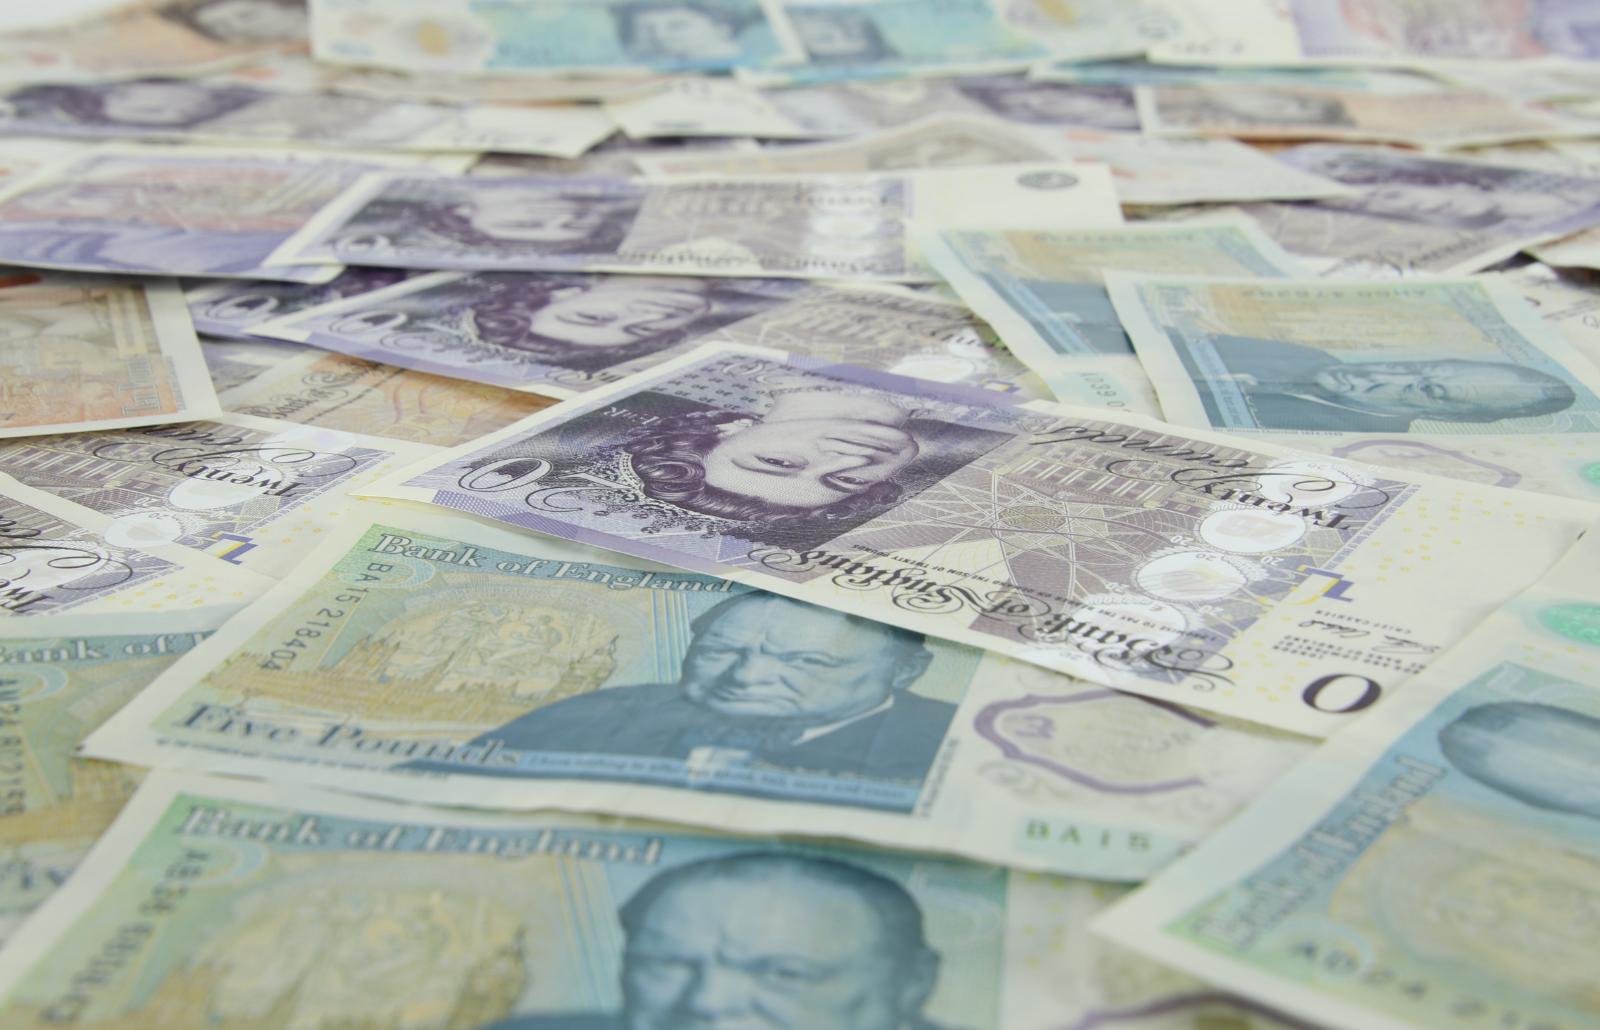 Virgate Government Schemes To Help During Lockdown Money